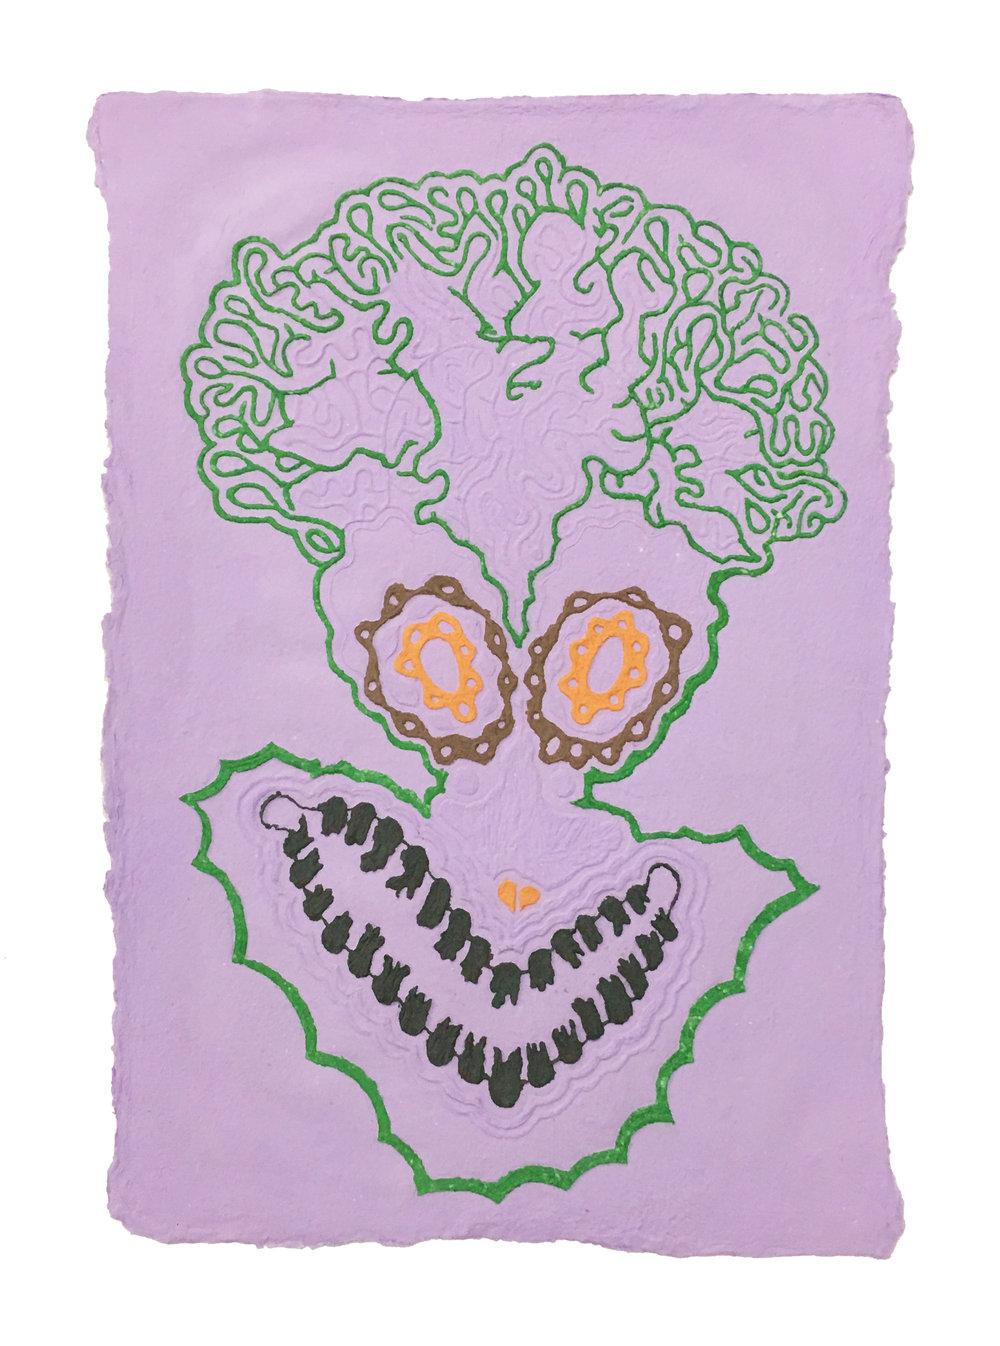 Daniel Wiener   Clip The Neurons , 2017  Paper pulp